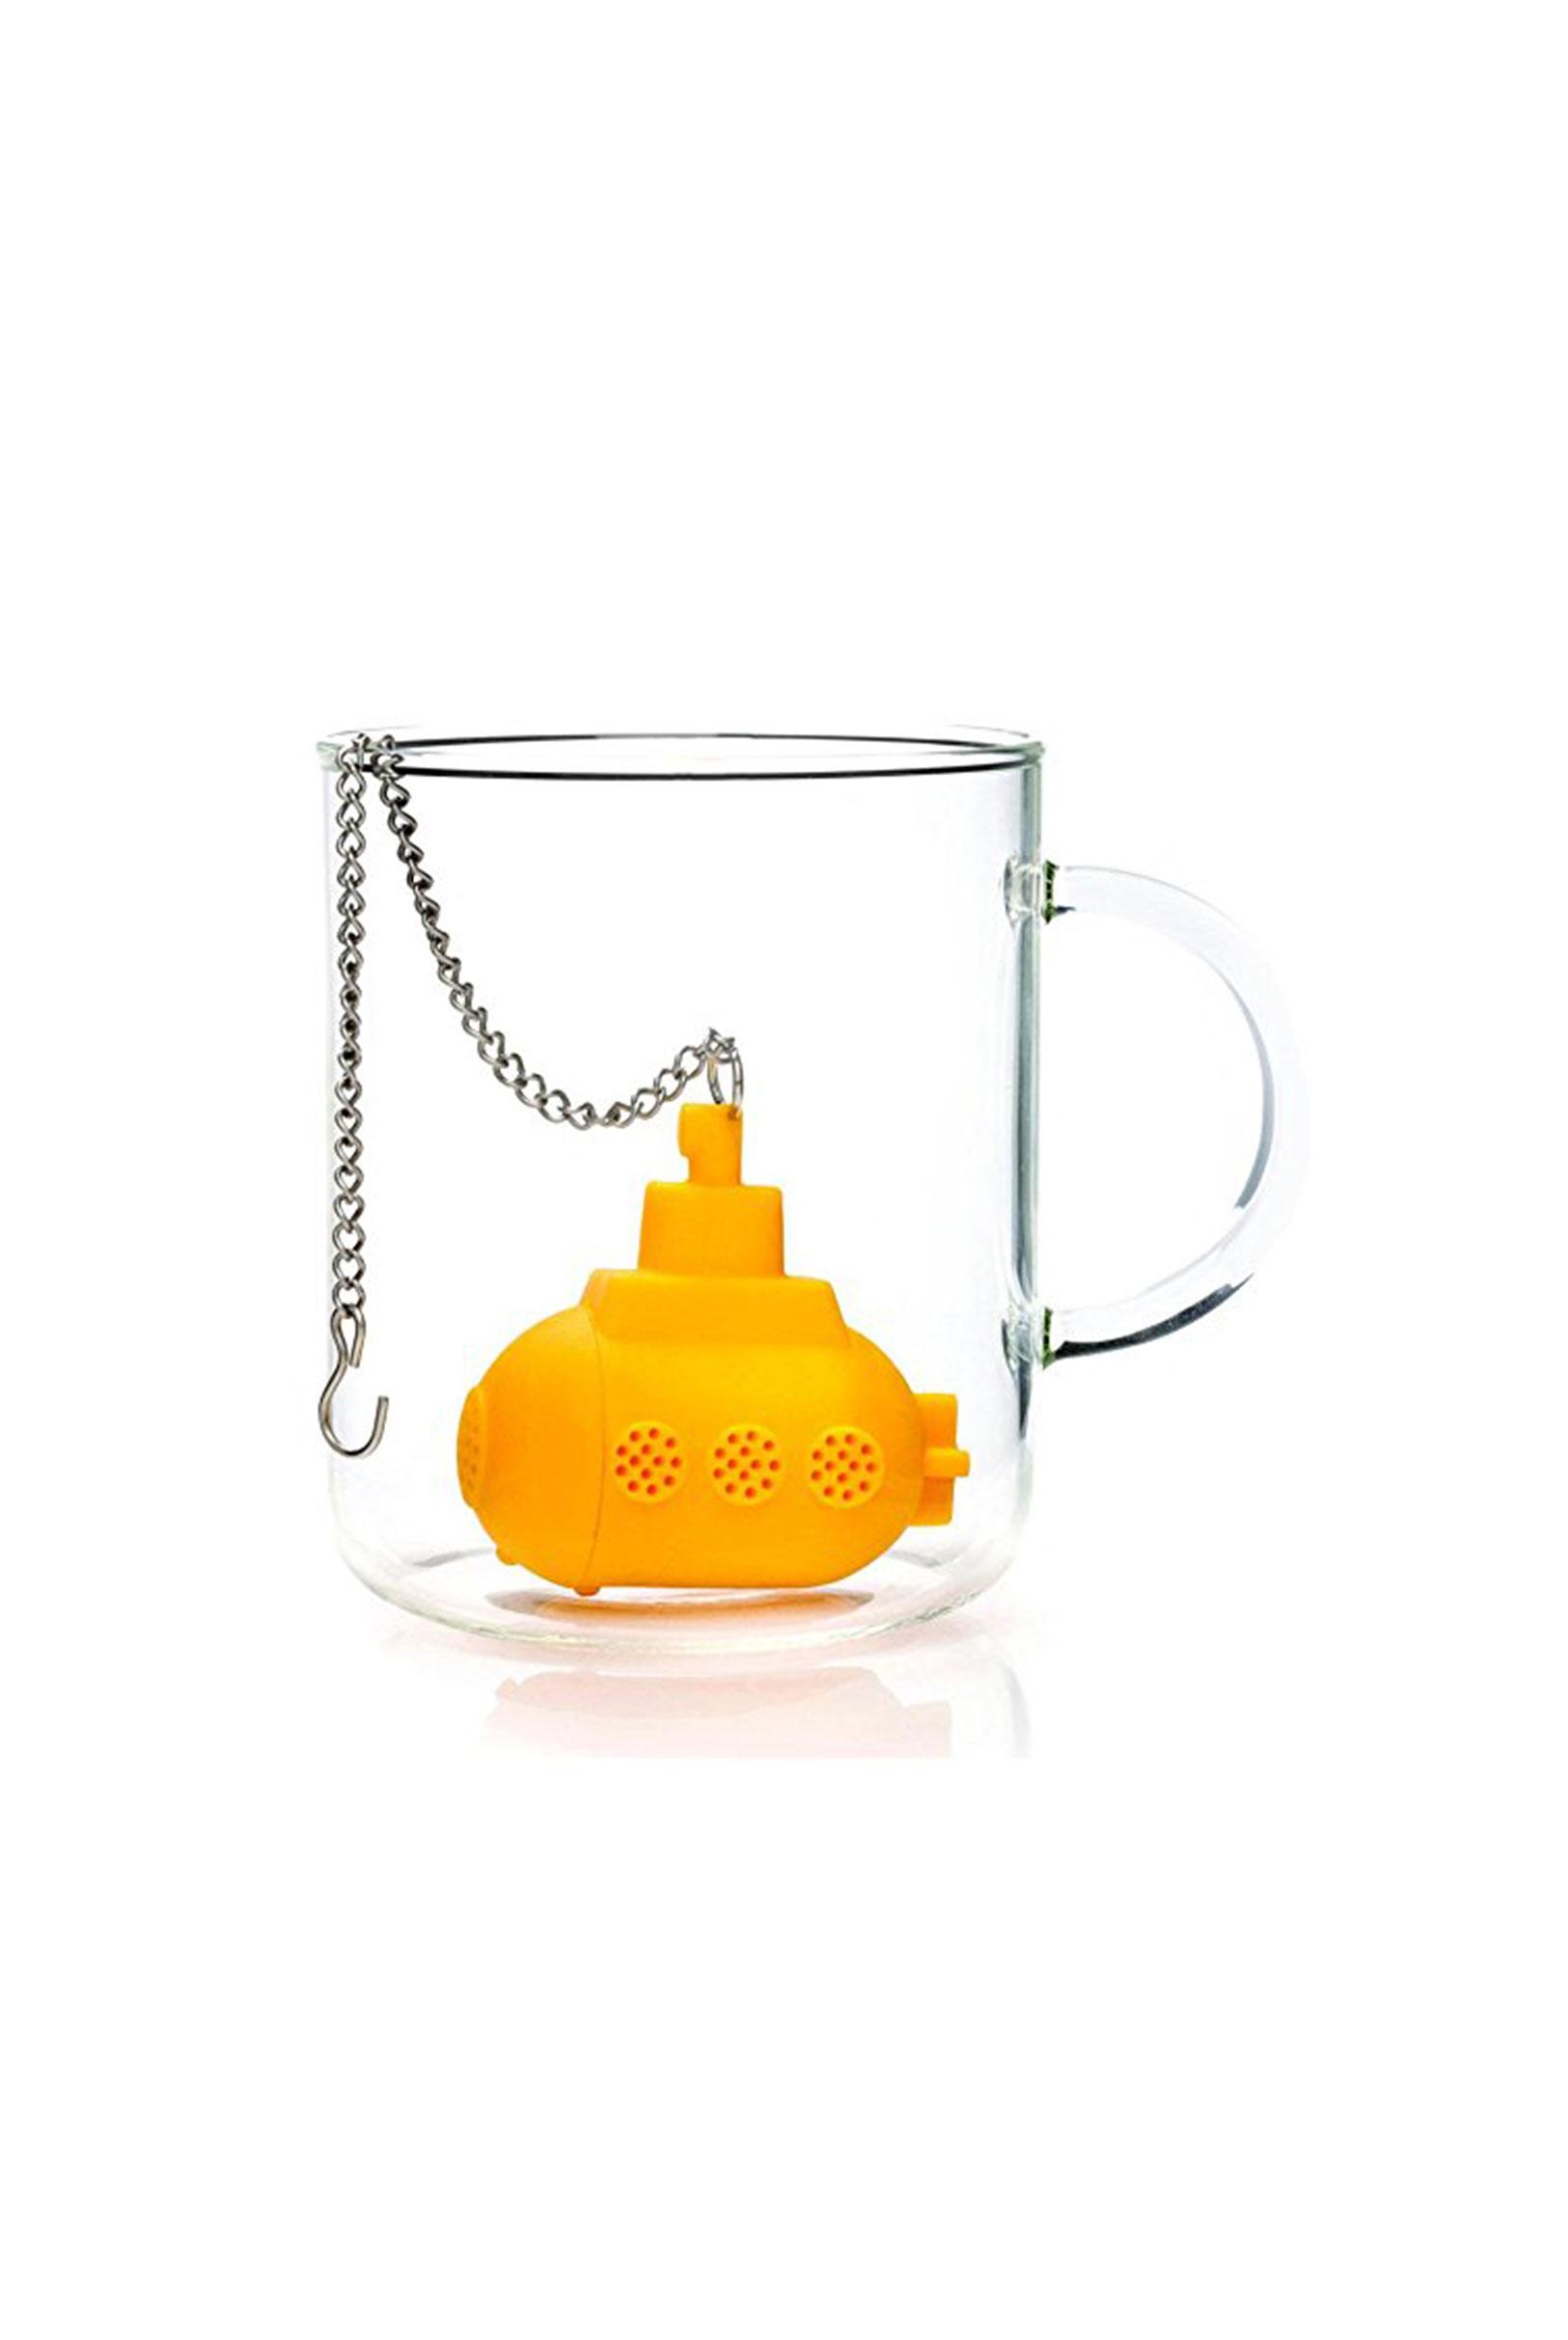 Tea-Infuser.jpg